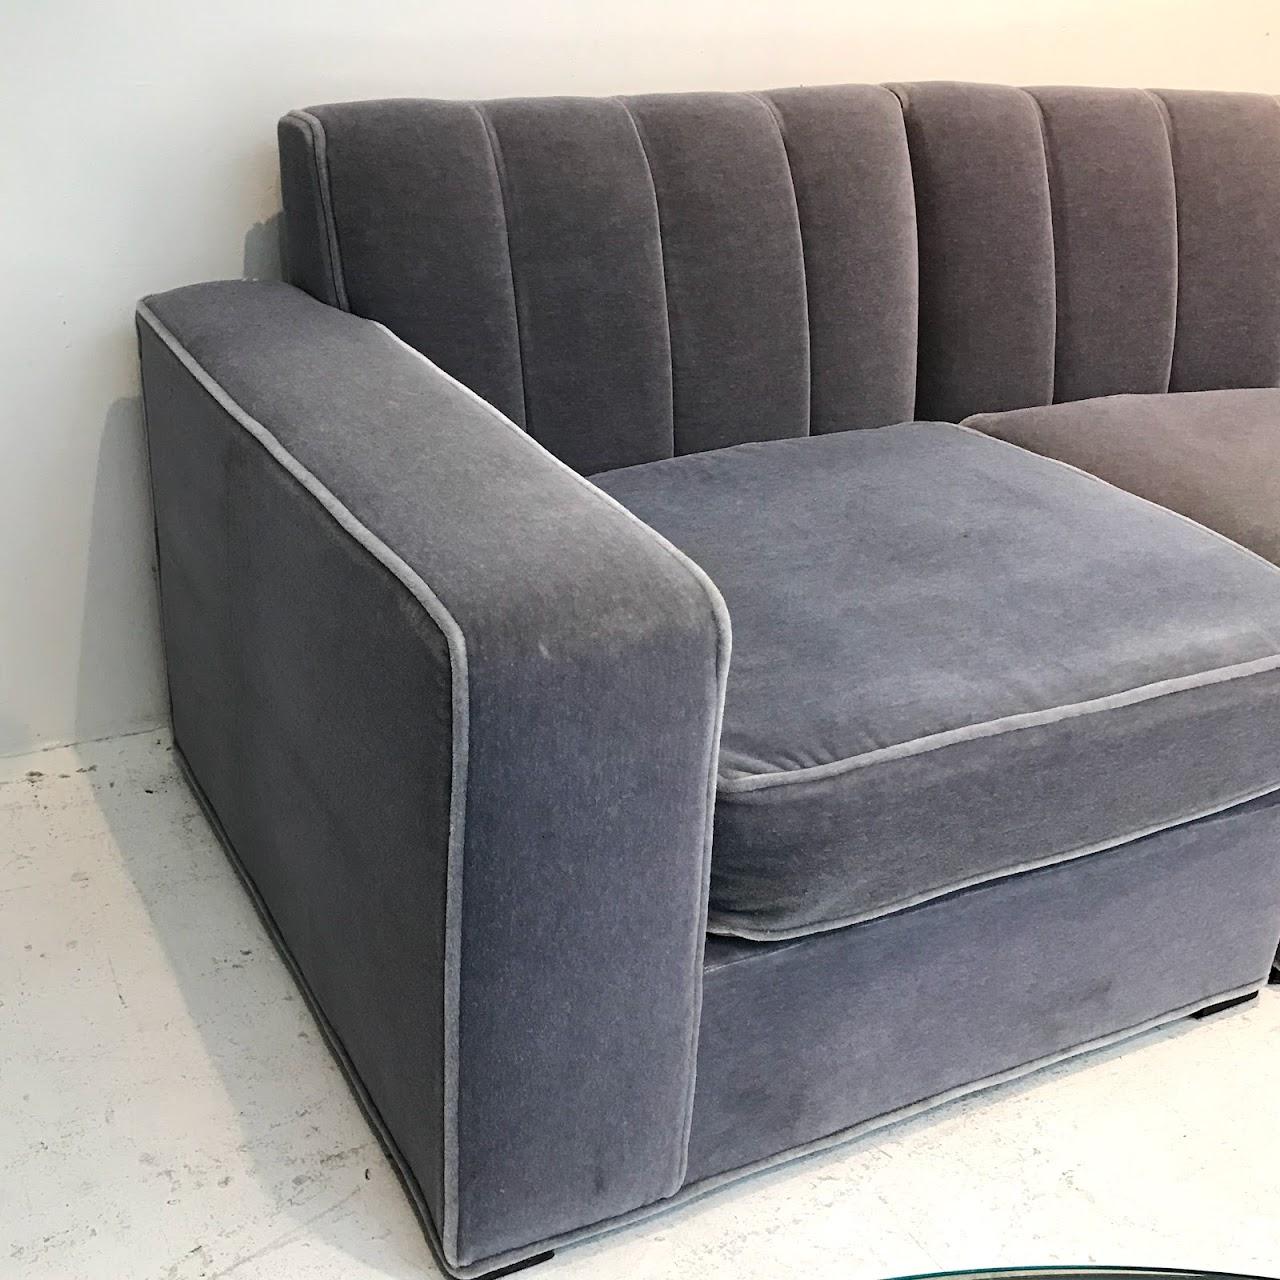 Enjoyable Lilac Mohair Curved Sectional Sofa Shophousingworks Ibusinesslaw Wood Chair Design Ideas Ibusinesslaworg